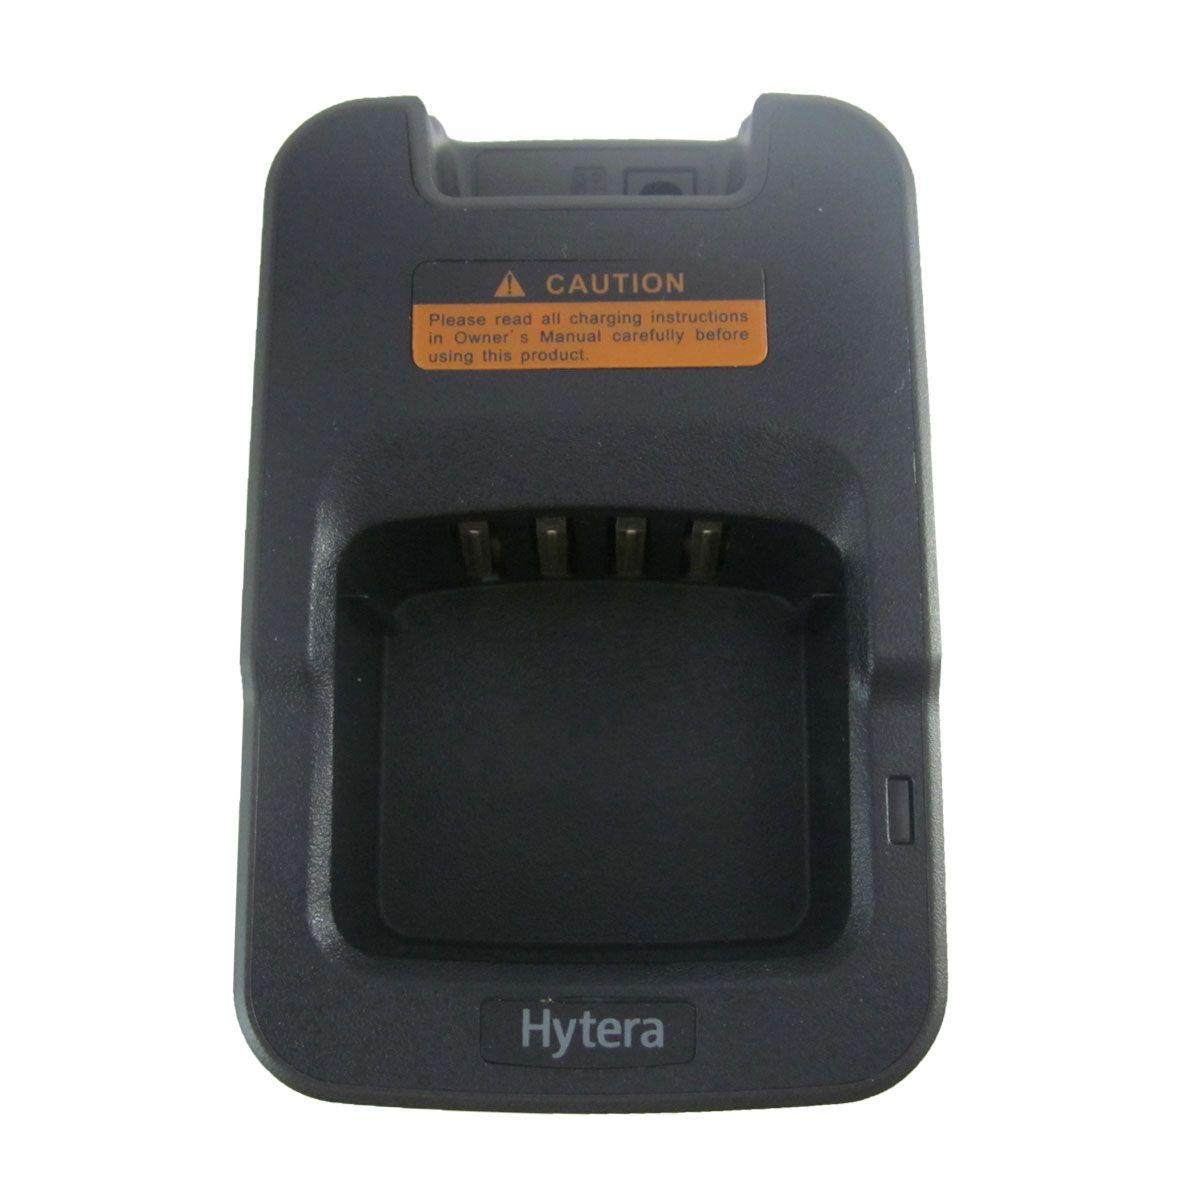 Cargador individual Hytera CH10A04 para radio PD706G CH10A04